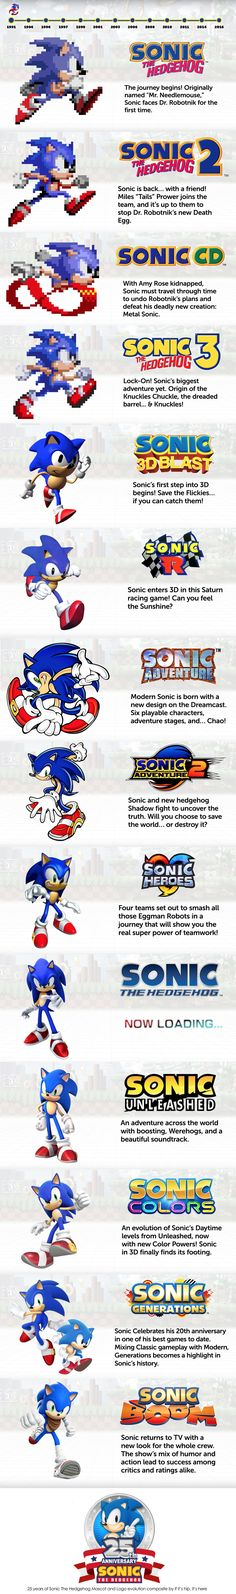 25 years of SEGA Sonic